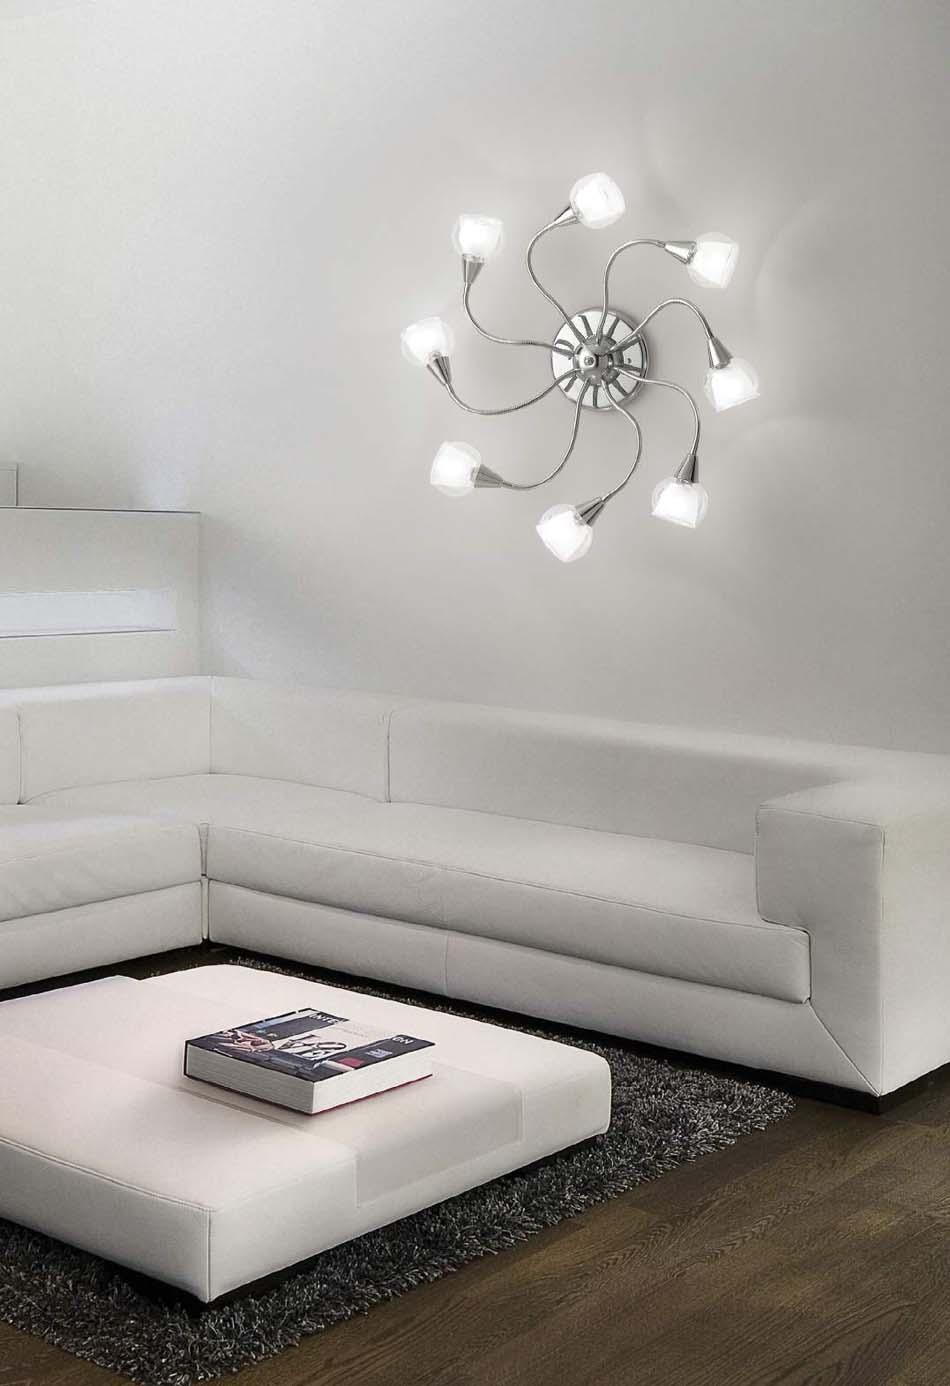 Lampade 47 soffitto parete Ideal Lux Tender – Toscana Arredamenti